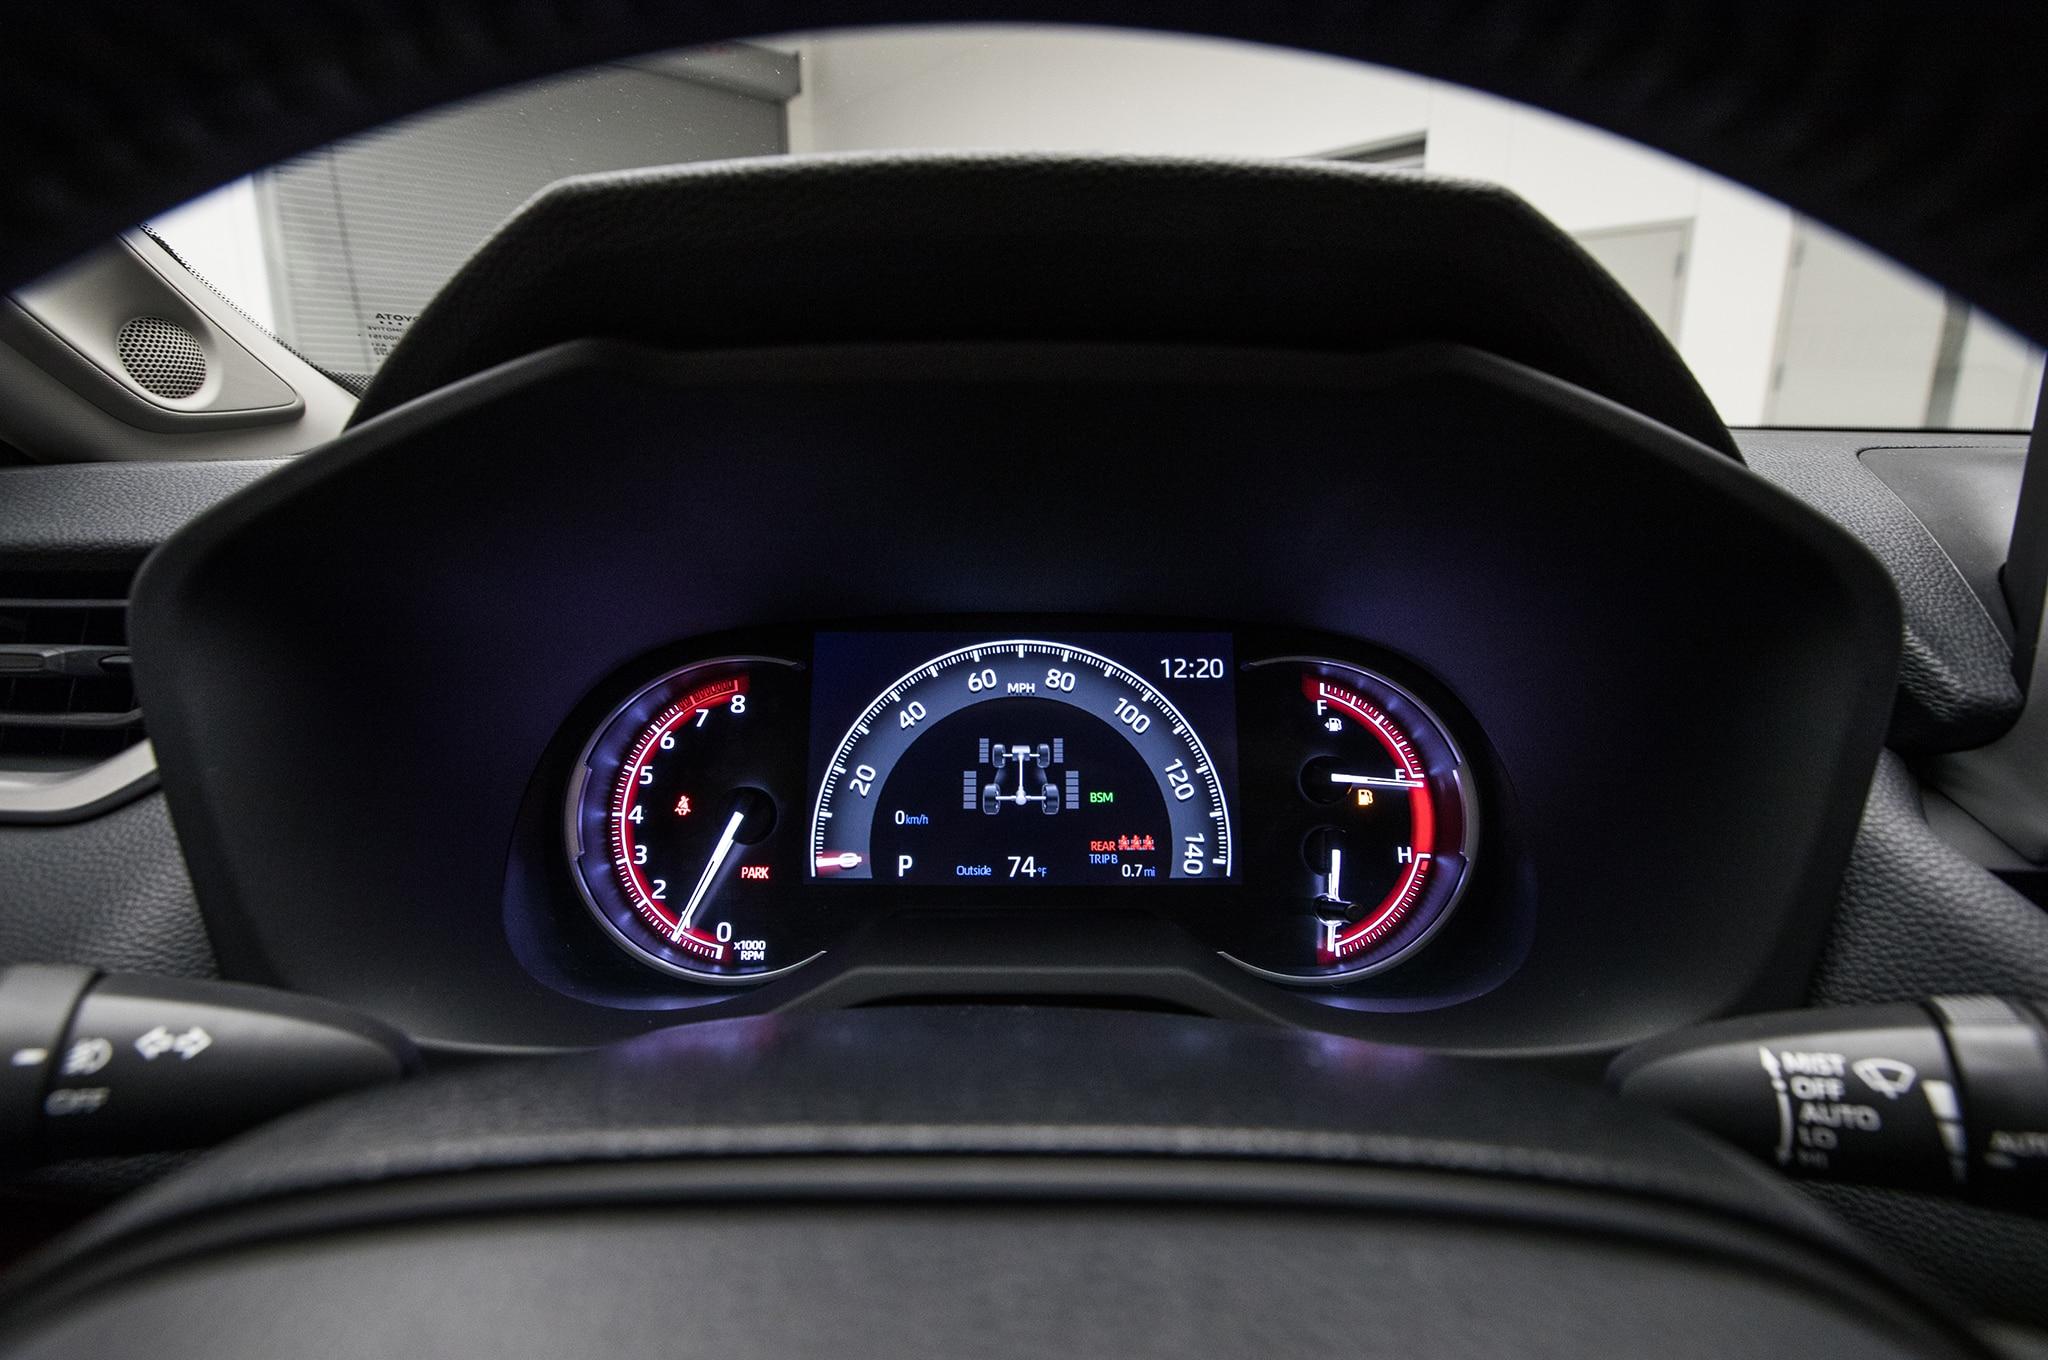 2019 Toyota RAV4 Hybrid instrument cluster 01 - Motor ...